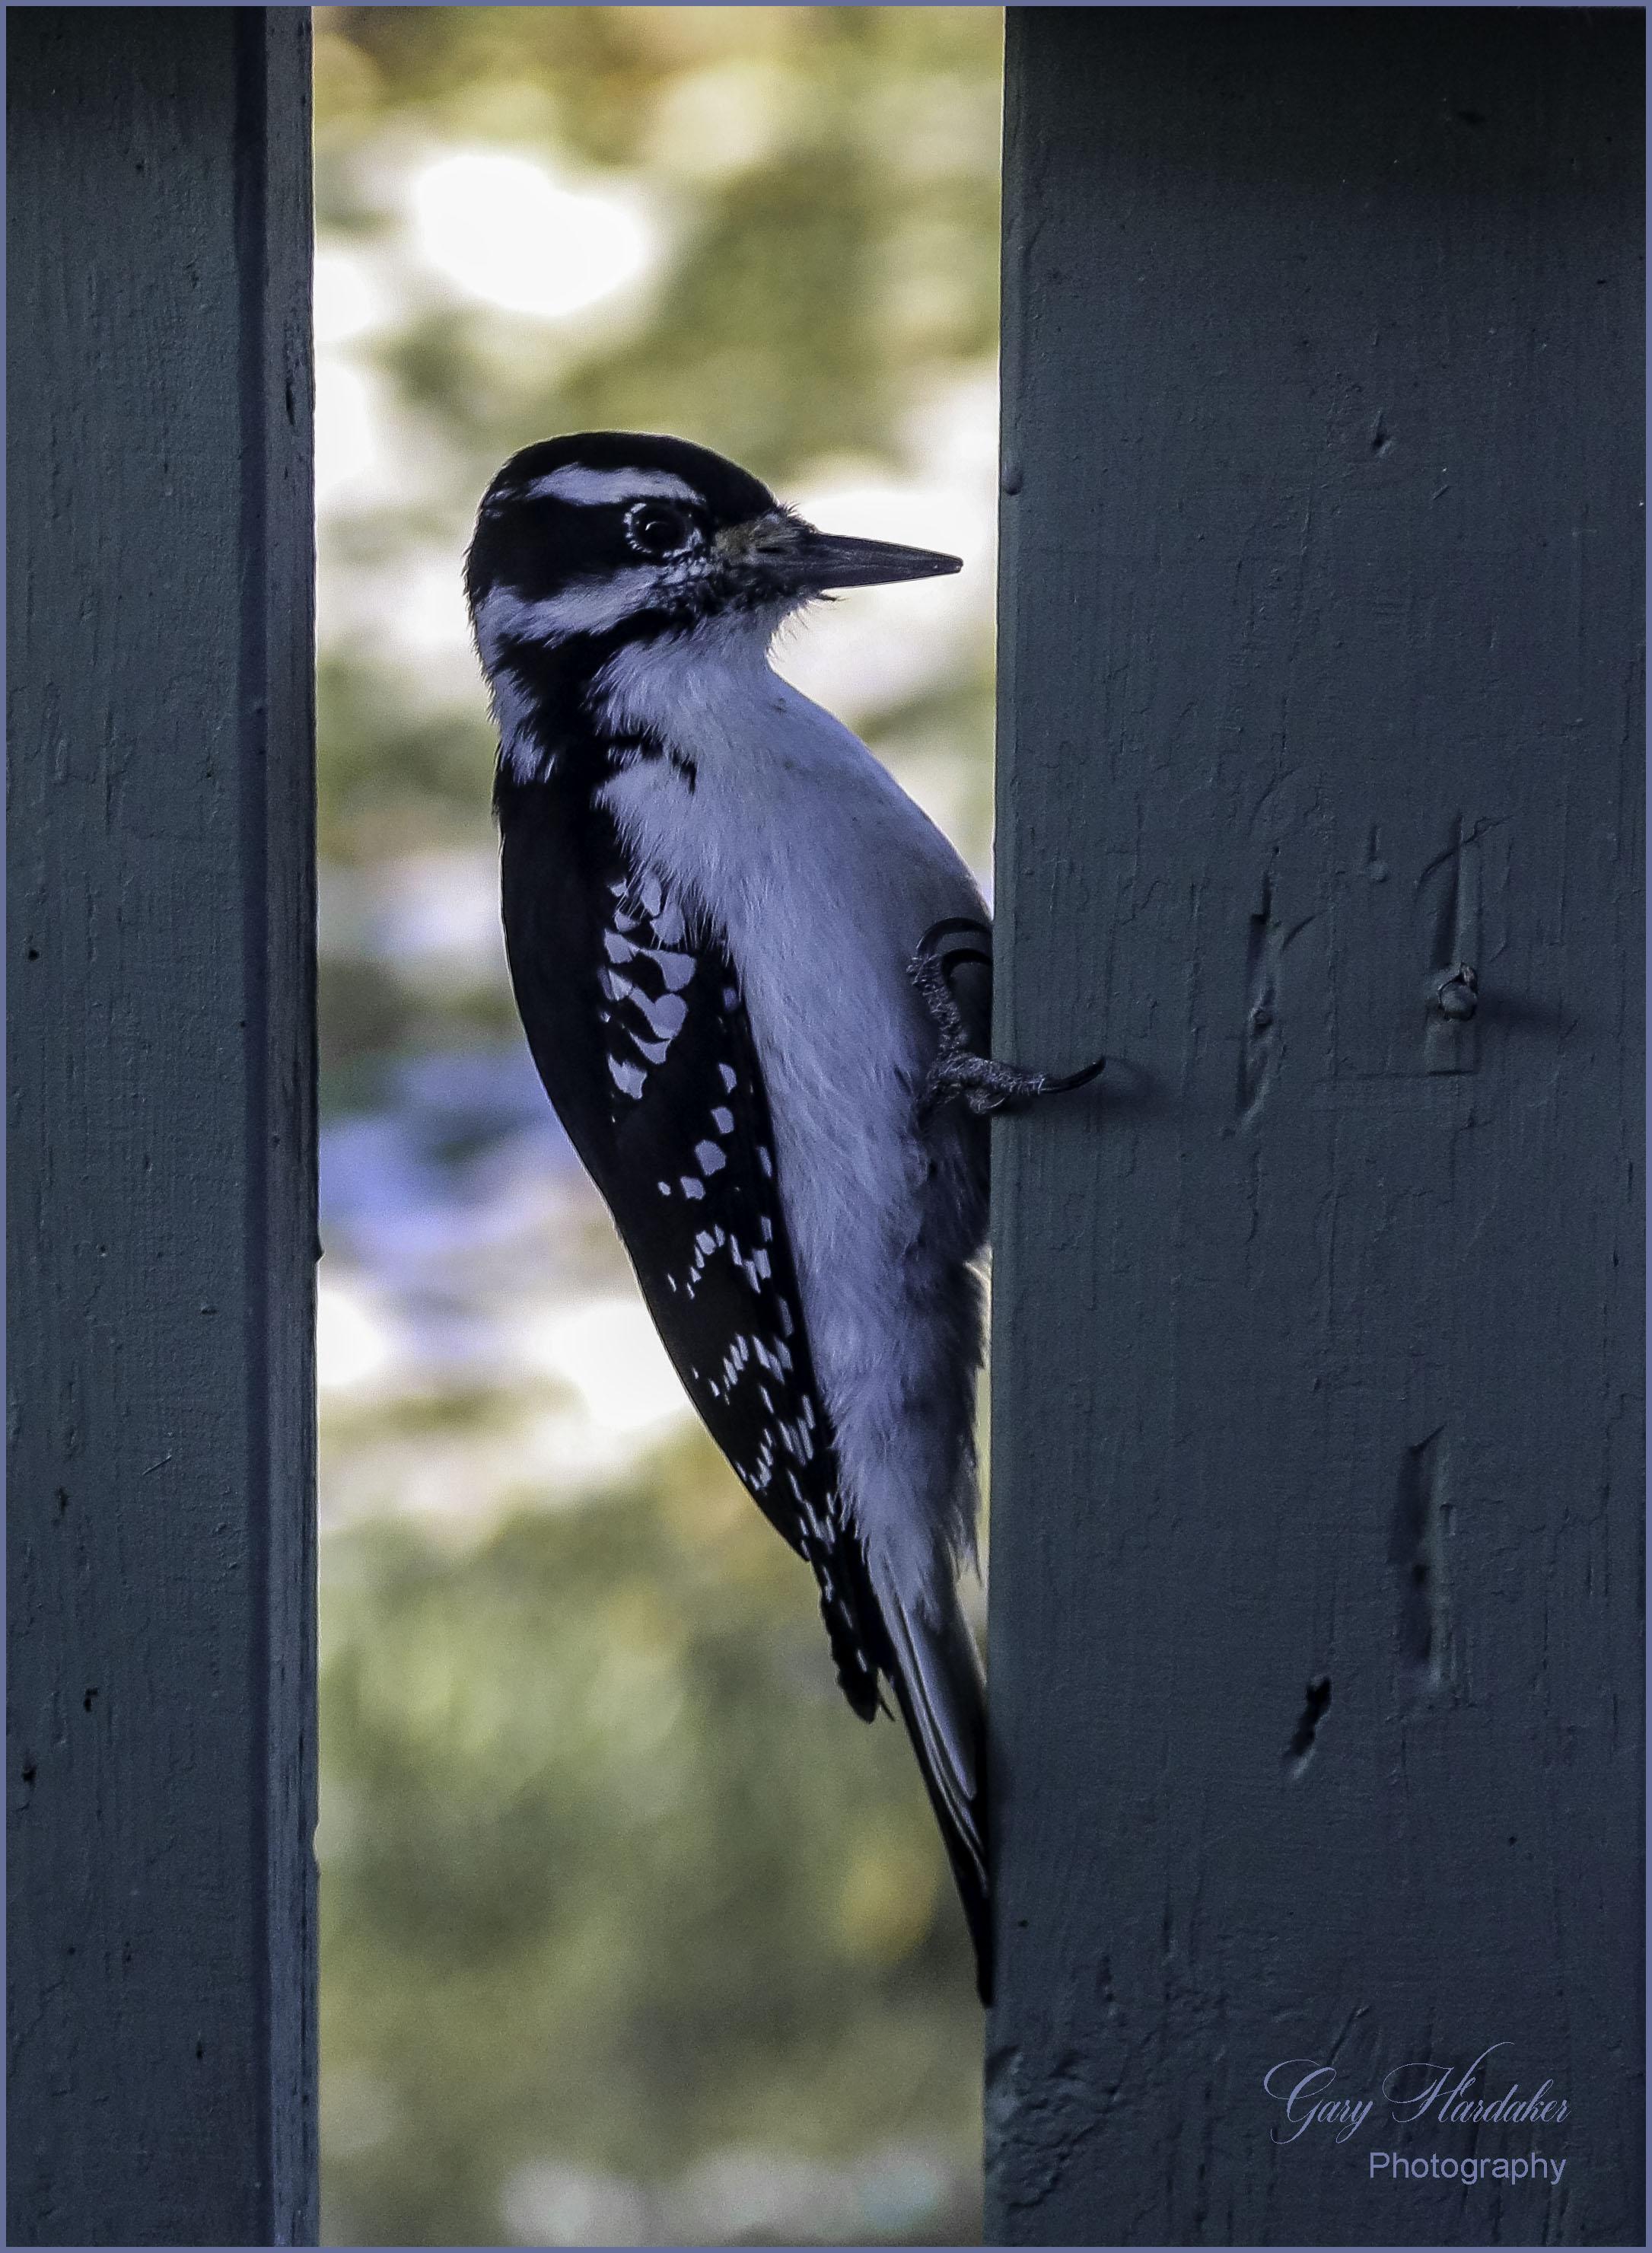 Woodpecker at work (on house)- Gary Hardaker